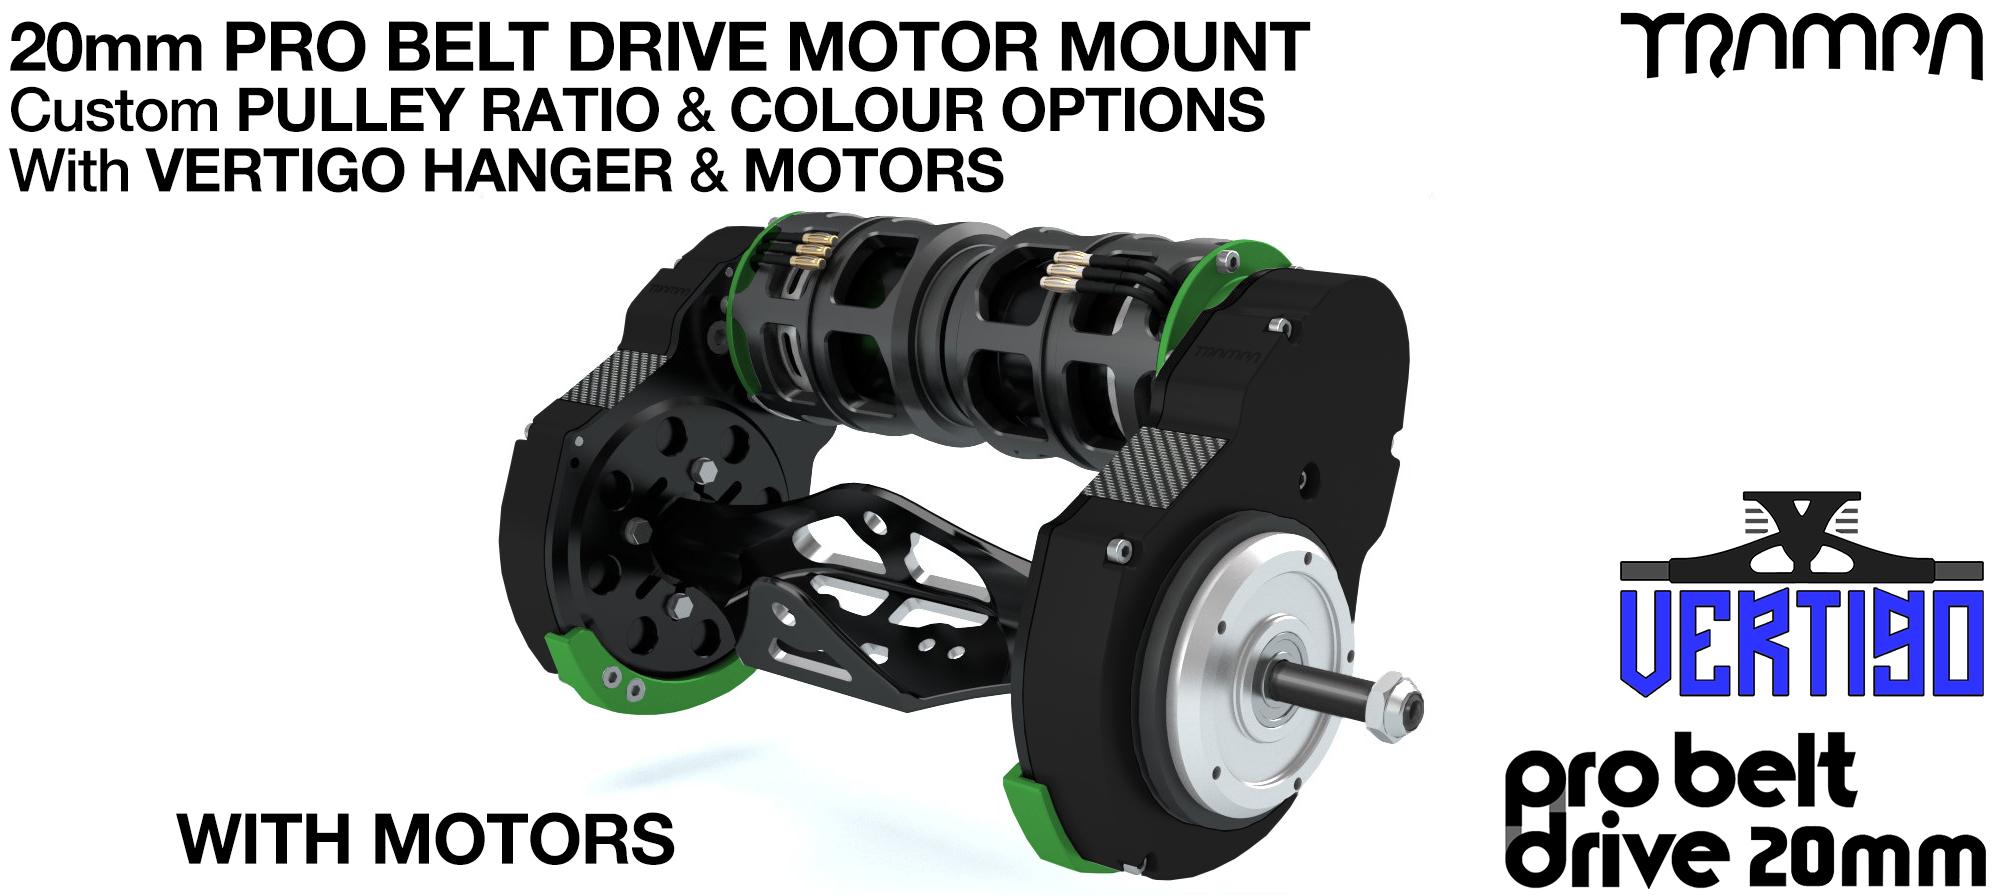 TRAMPA's 16mm  PRO Belt Drive TWIN Motor Mountainboard WITH Motors Mountred on a Precision VERTIGO Hanger